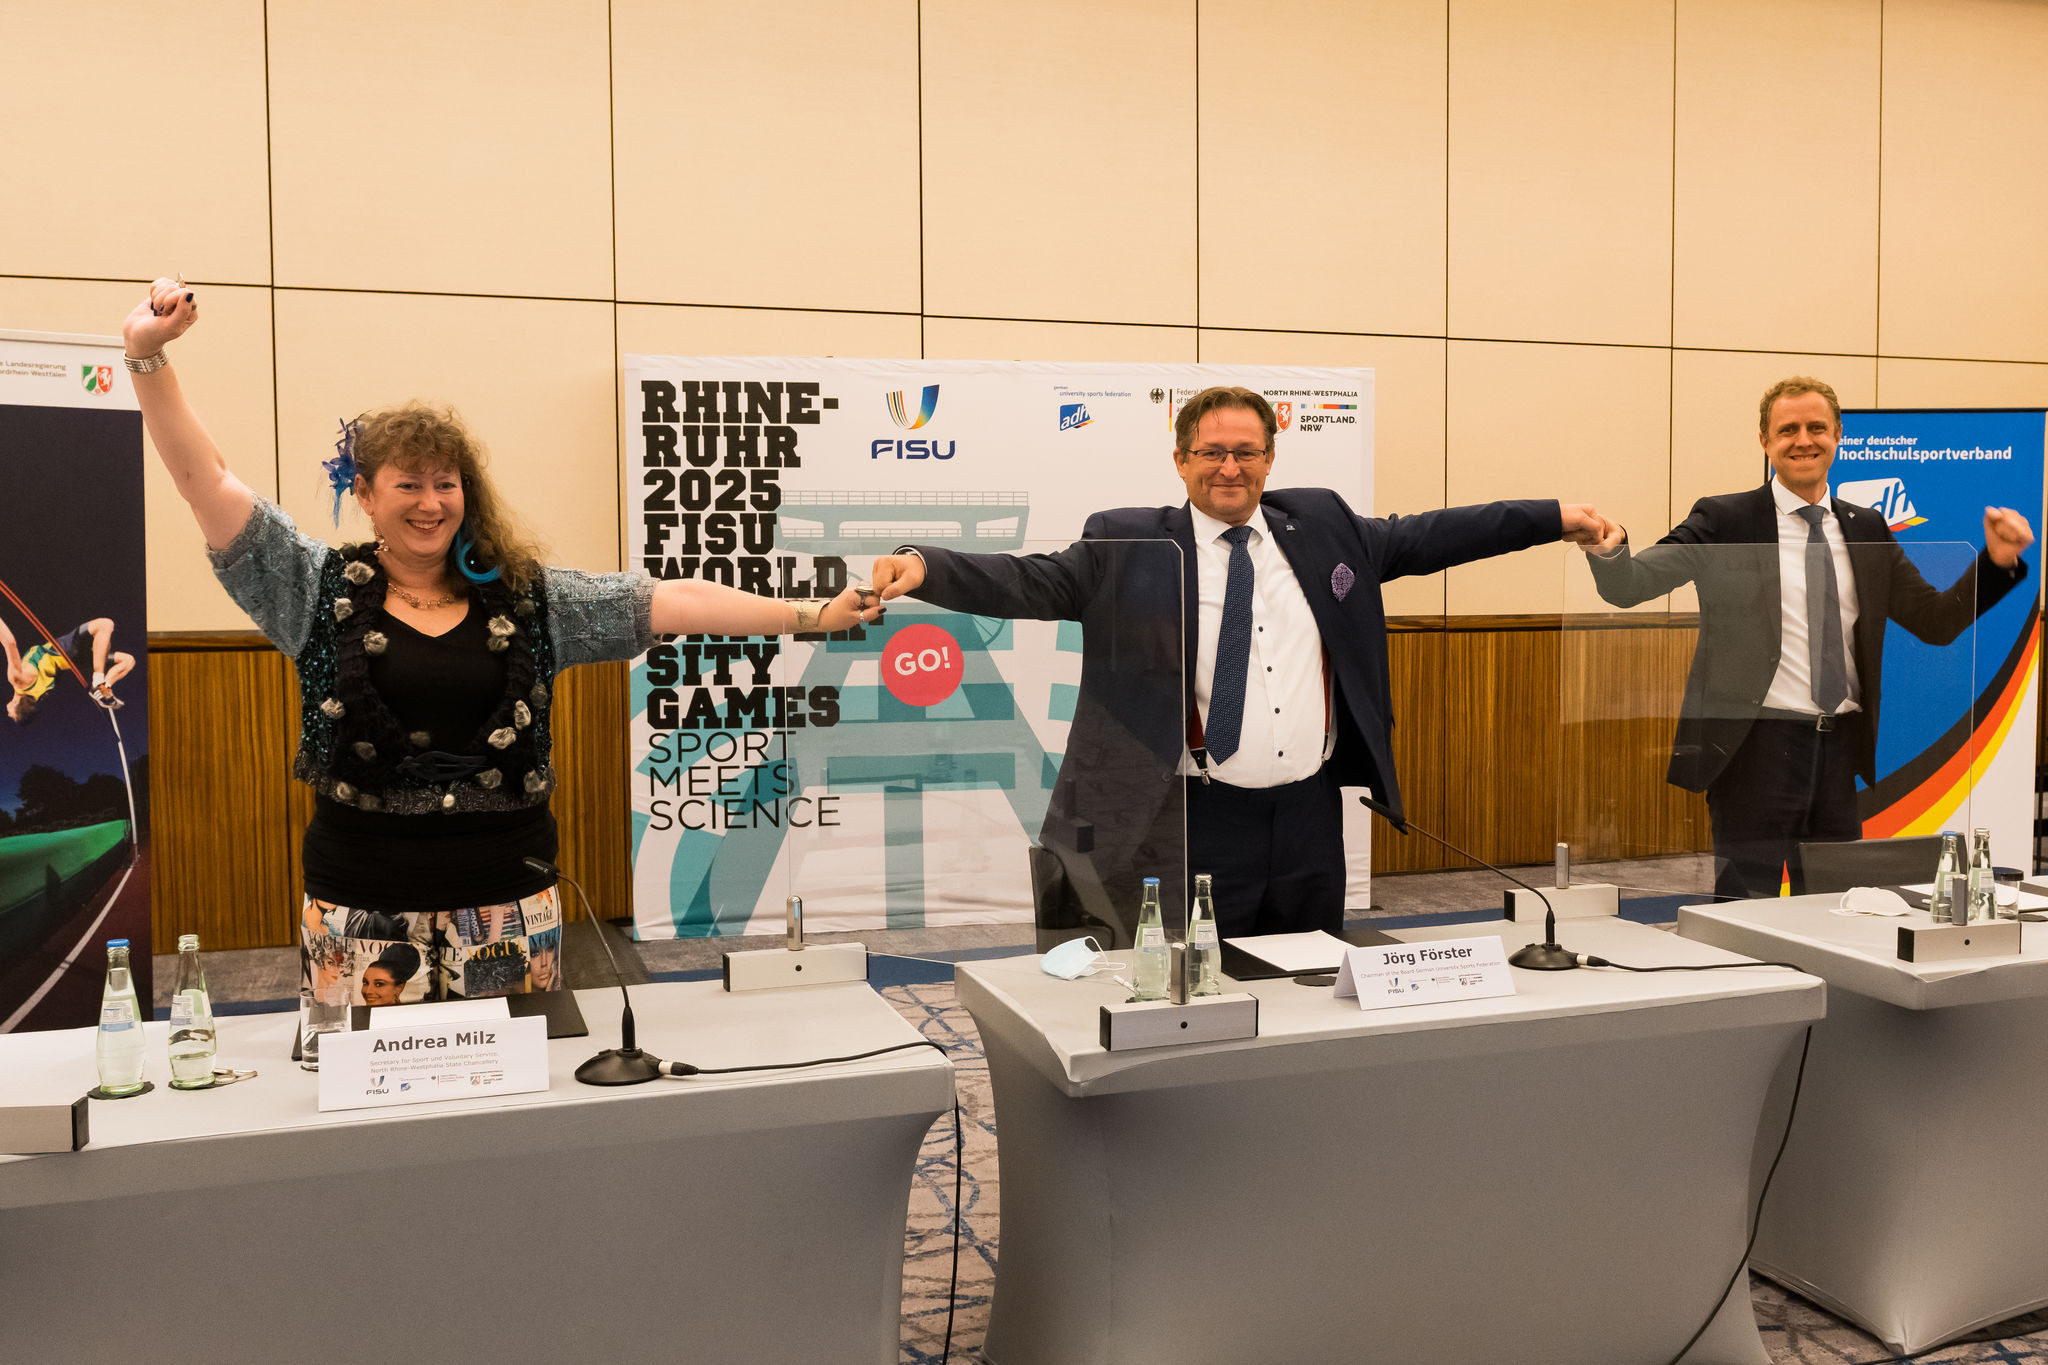 The 2025 Summer World University Games will be held in Rhine-Ruhr, Germany ©FISU